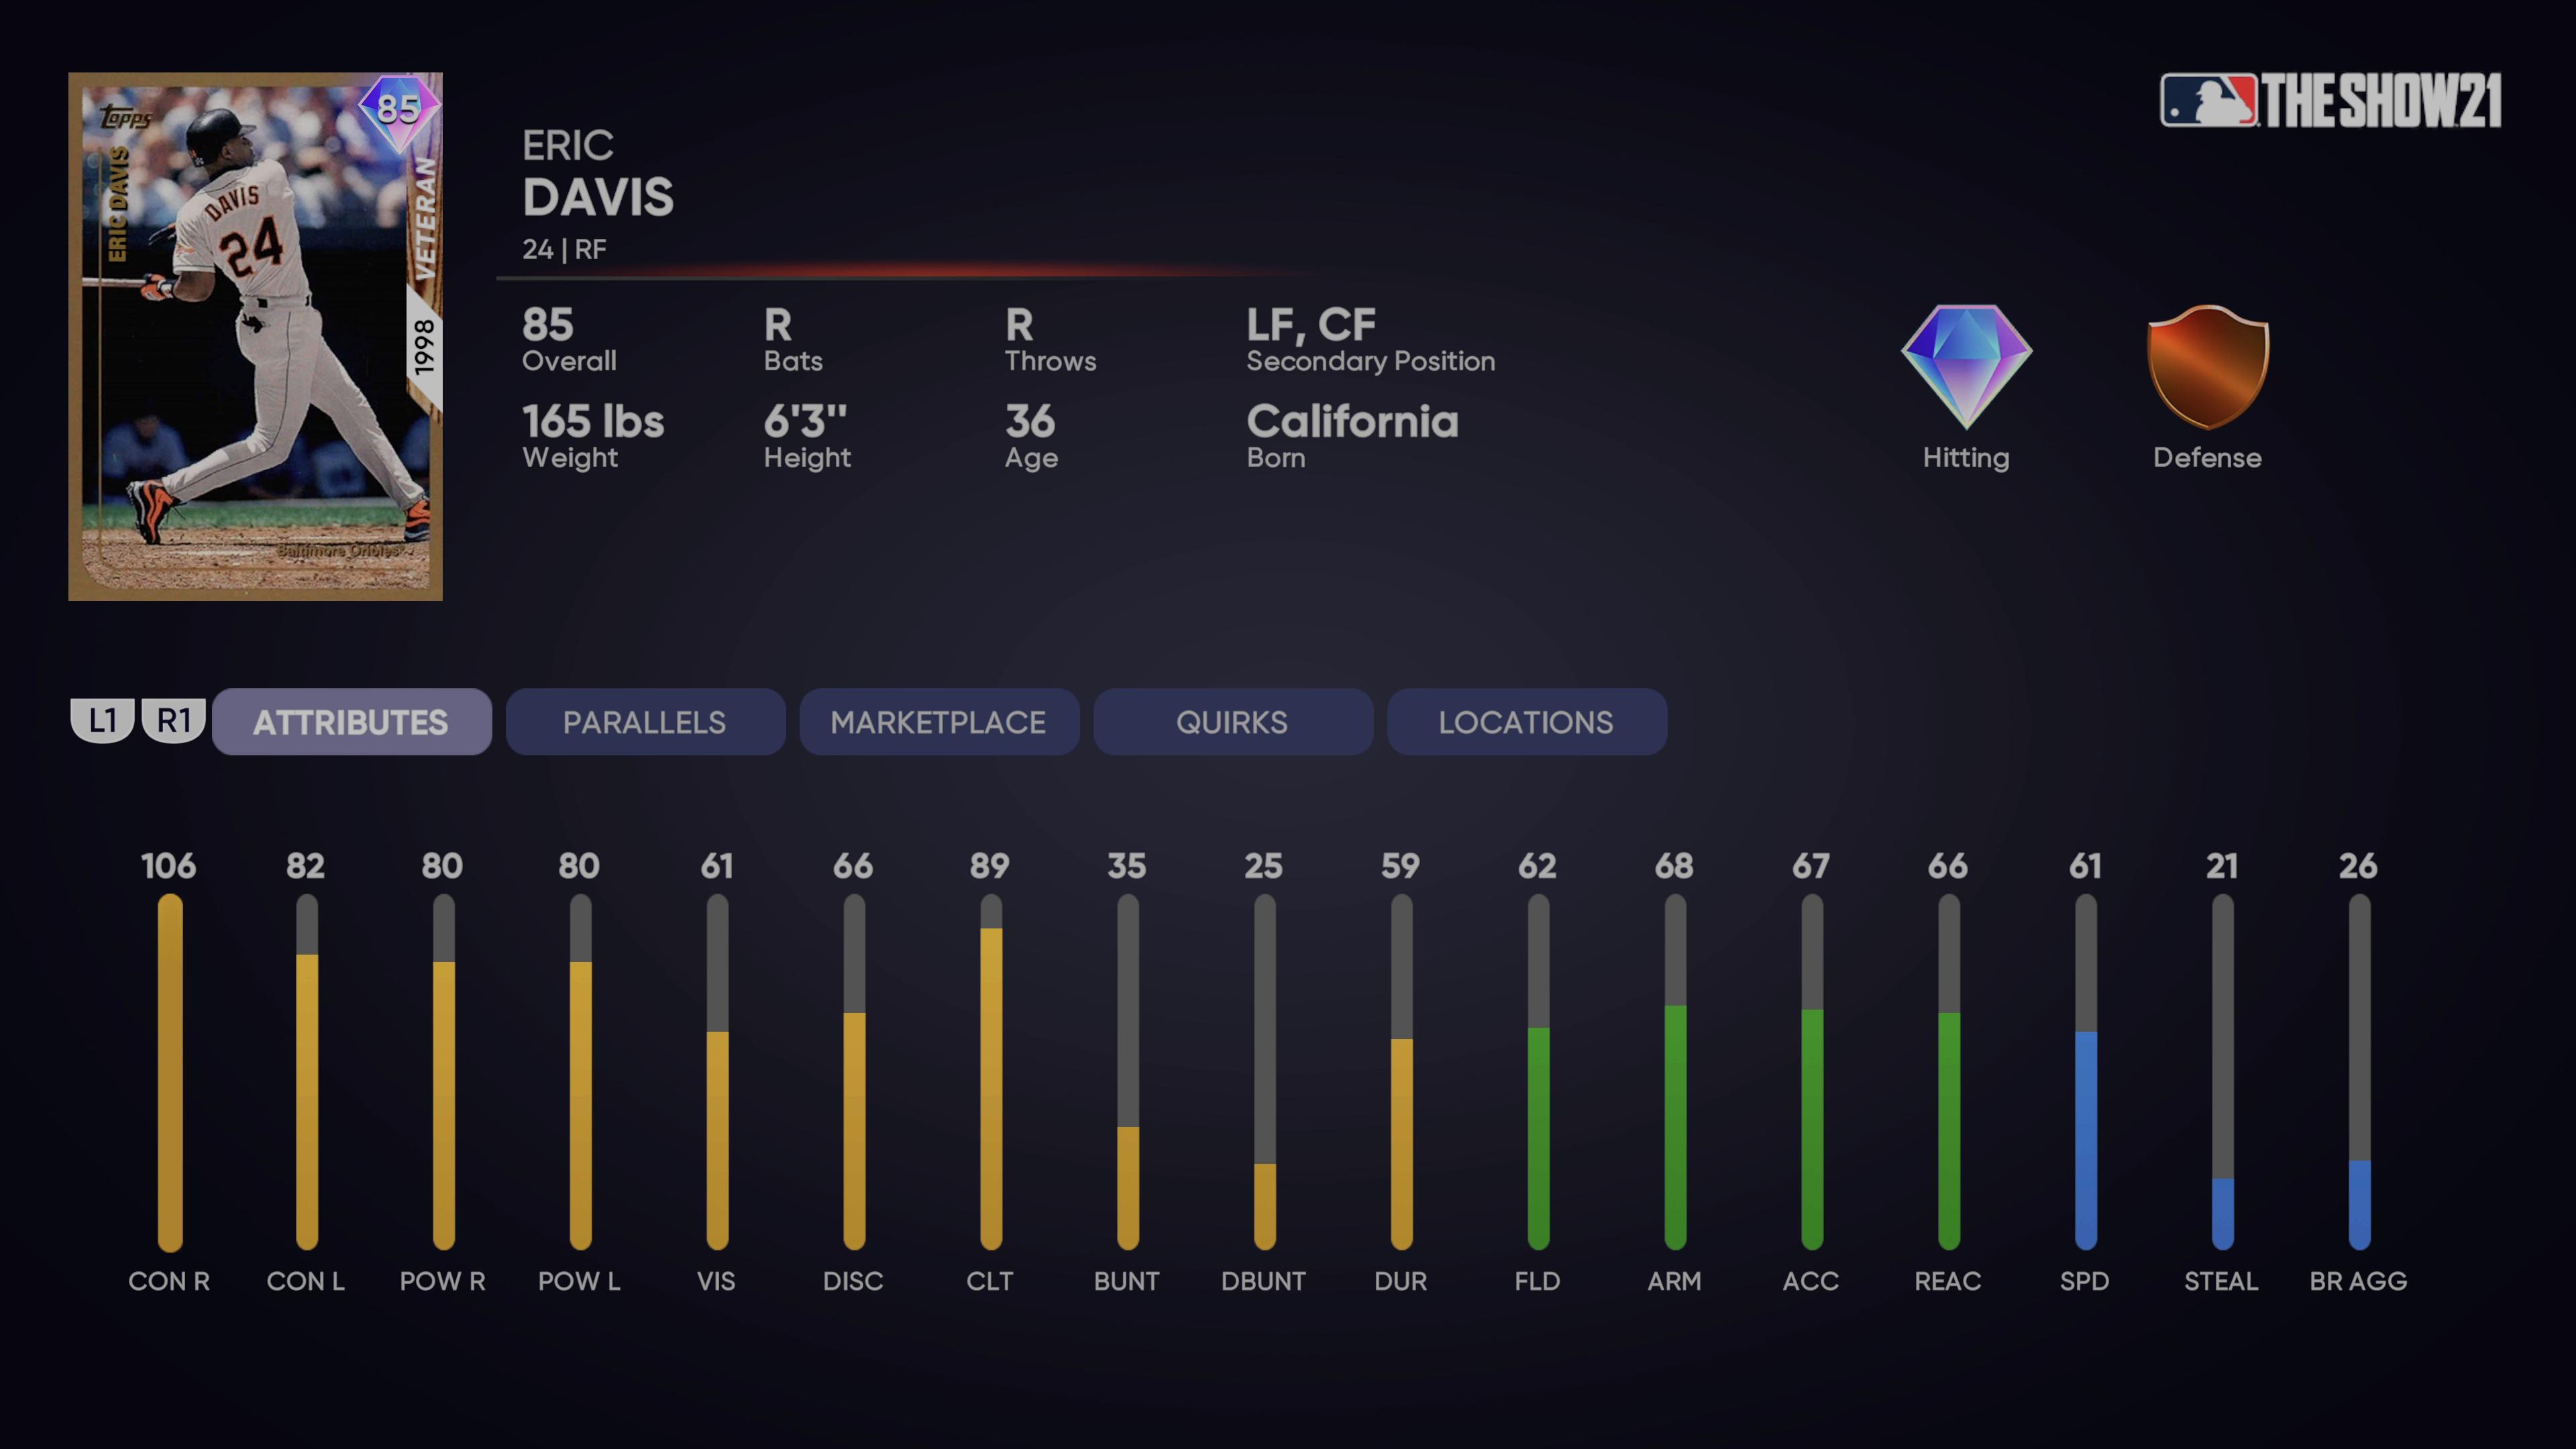 MLB The Show 21 - veteran eric davis attributes